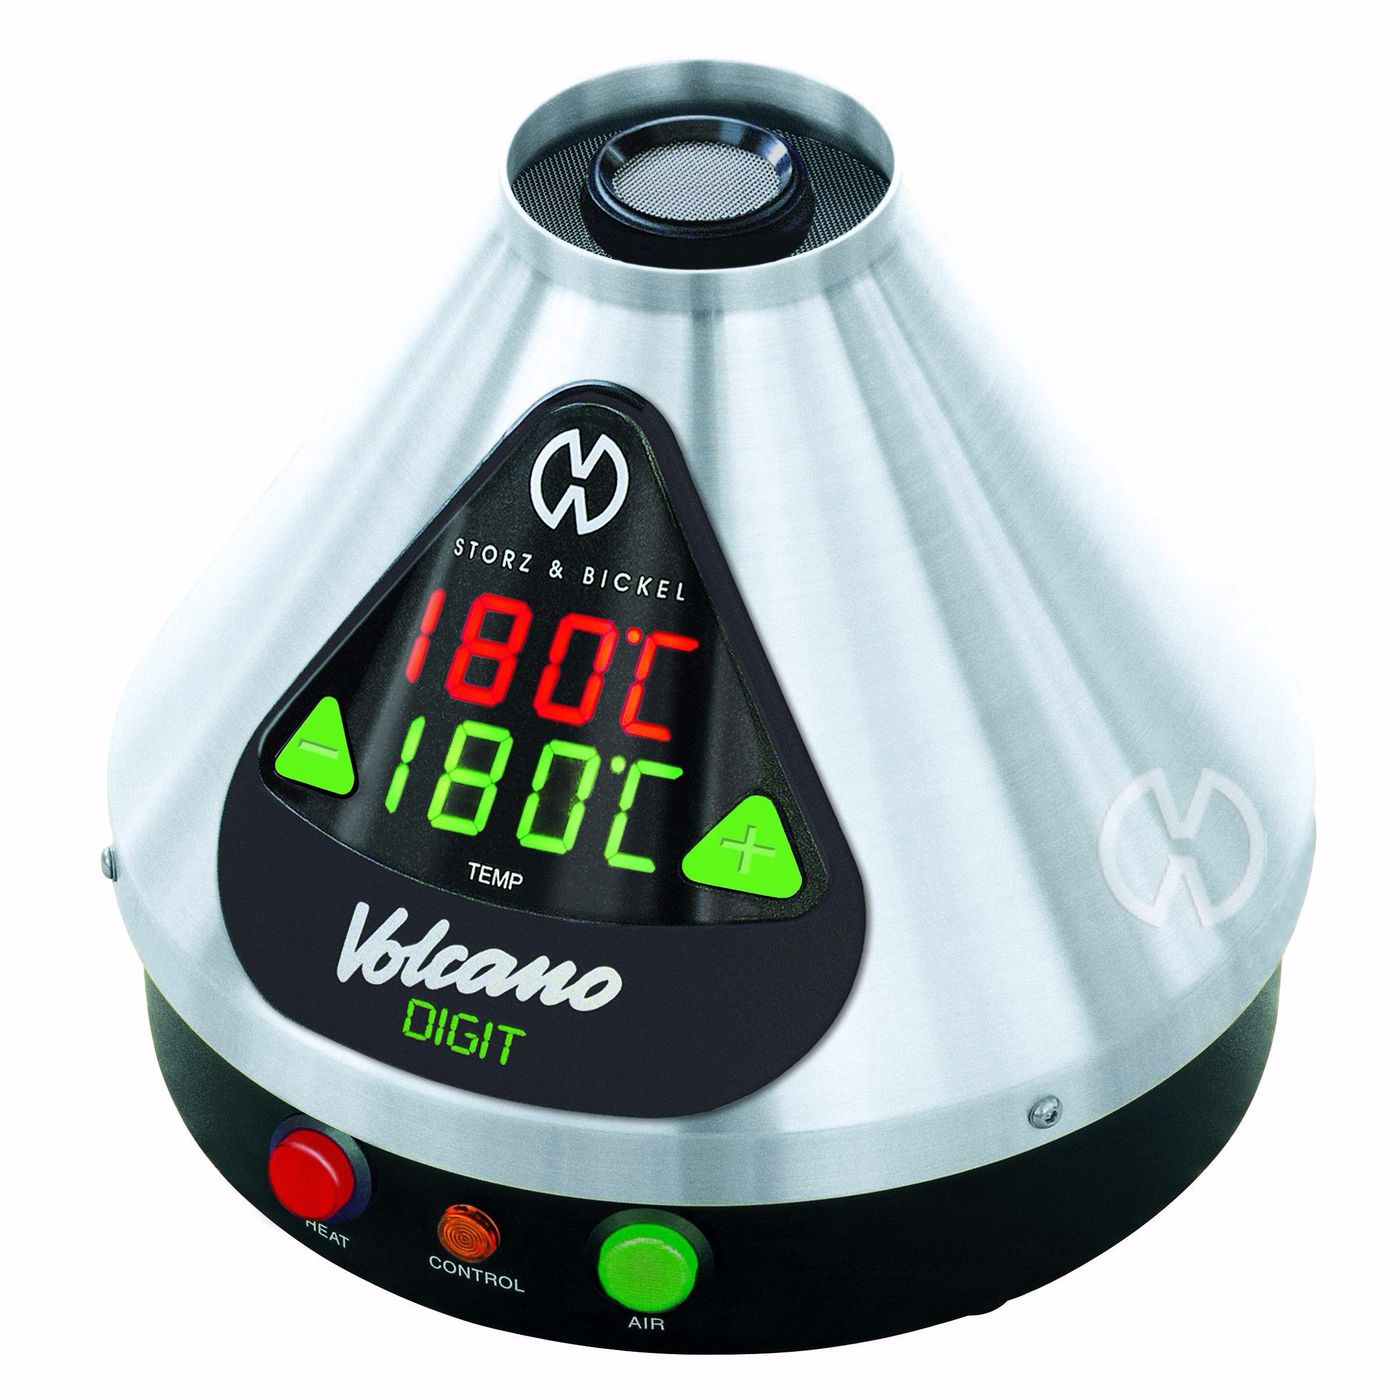 Buy Volcano Digit Vaporizer-weed vape for sale Ireland